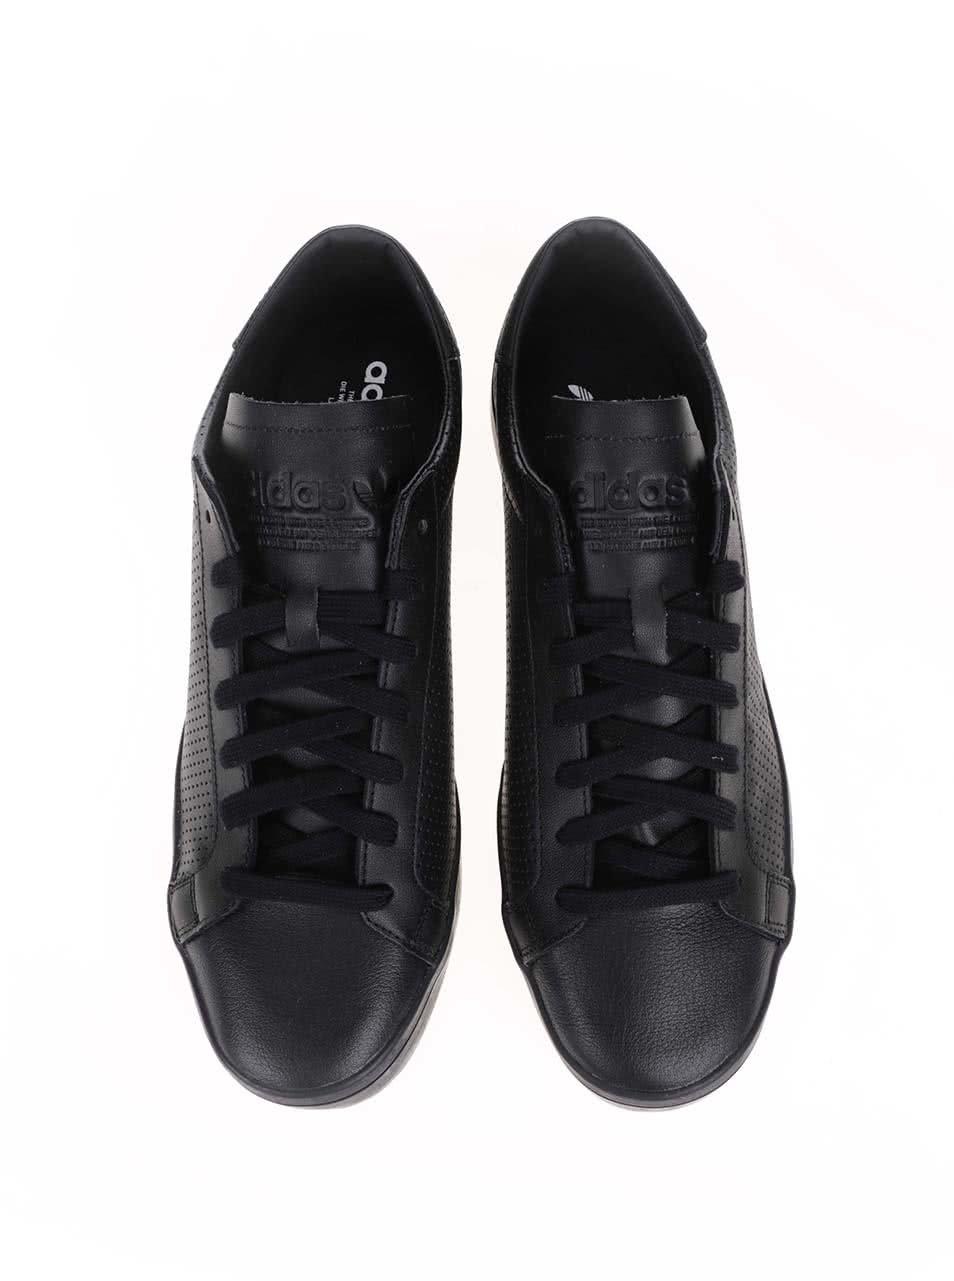 bd3f8ec7736 Černé pánské kožené tenisky adidas Originals Court Vantage ...